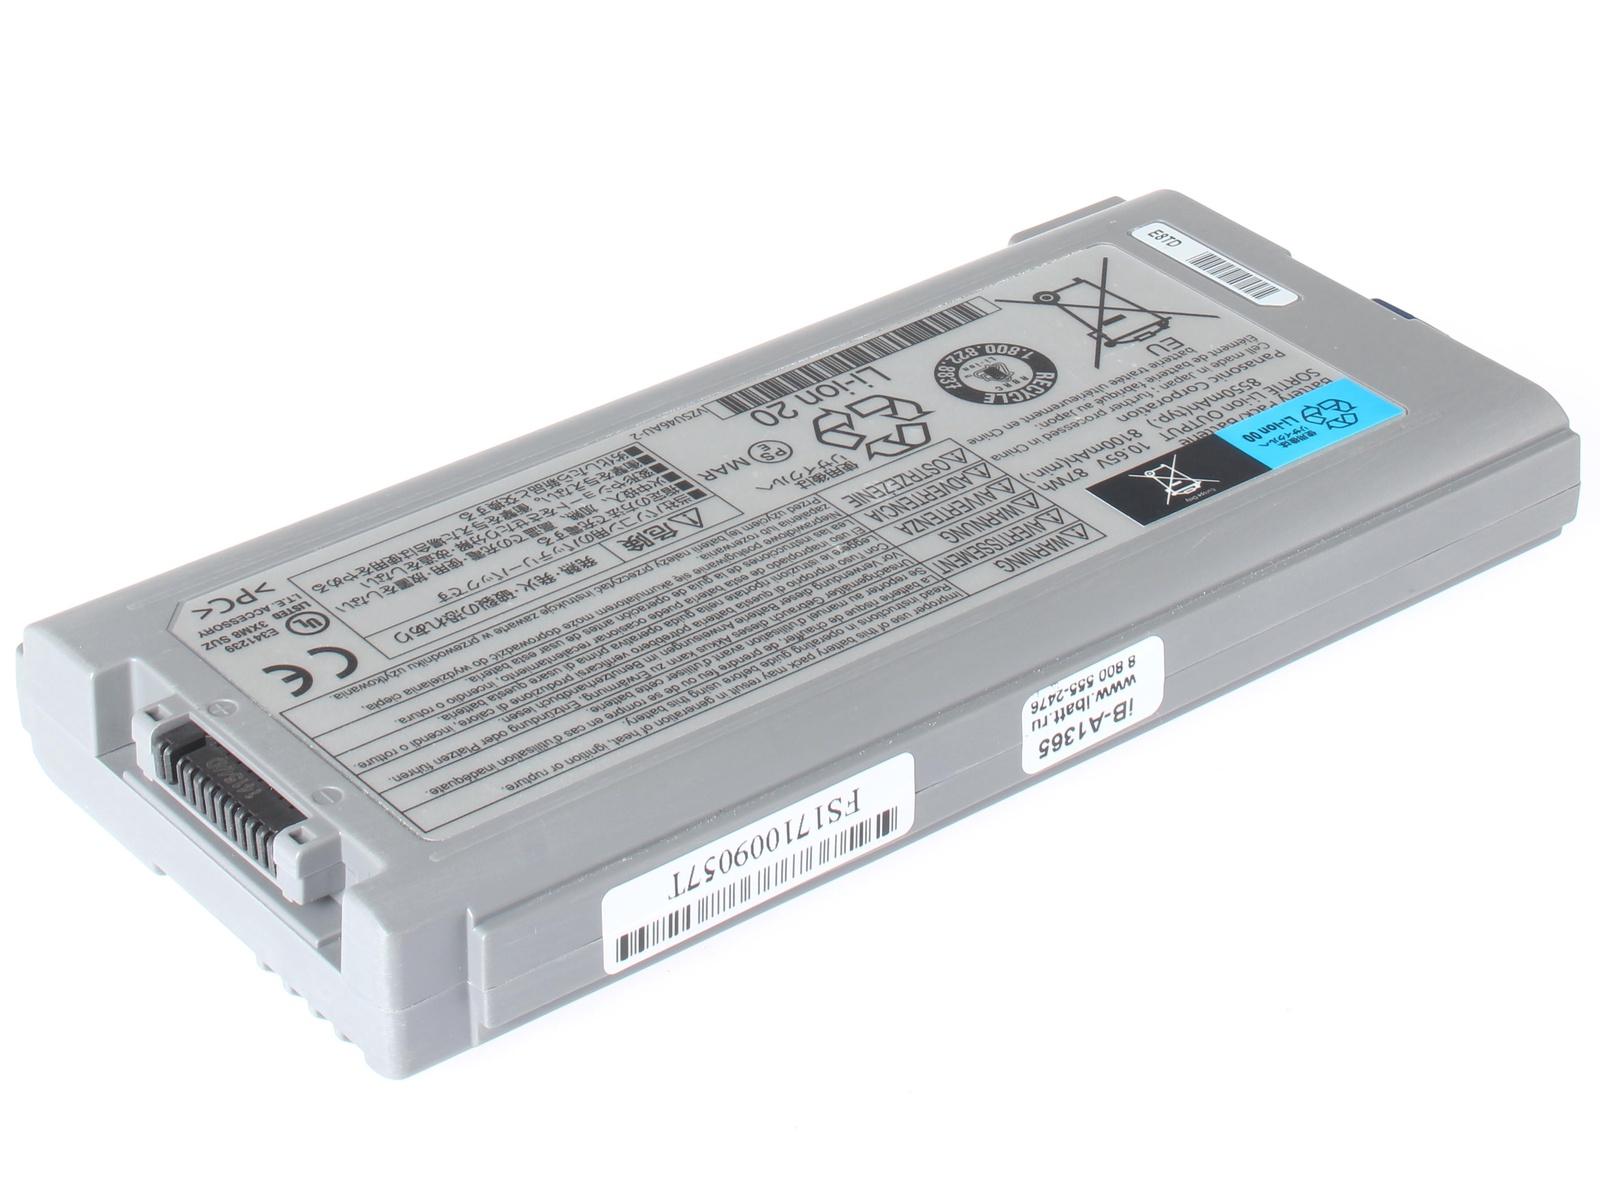 Аккумуляторная батарея iBatt iB-A1-A1365 8400mAh для ноутбуков Panasonic CF-VZSU1430U, CF-VZSU46, CF-VZSU46AU, CF-VZSU46S, CF-VZSU46U, CF-VZSU72U, CF-VZSU71U, iB-A1365, цена